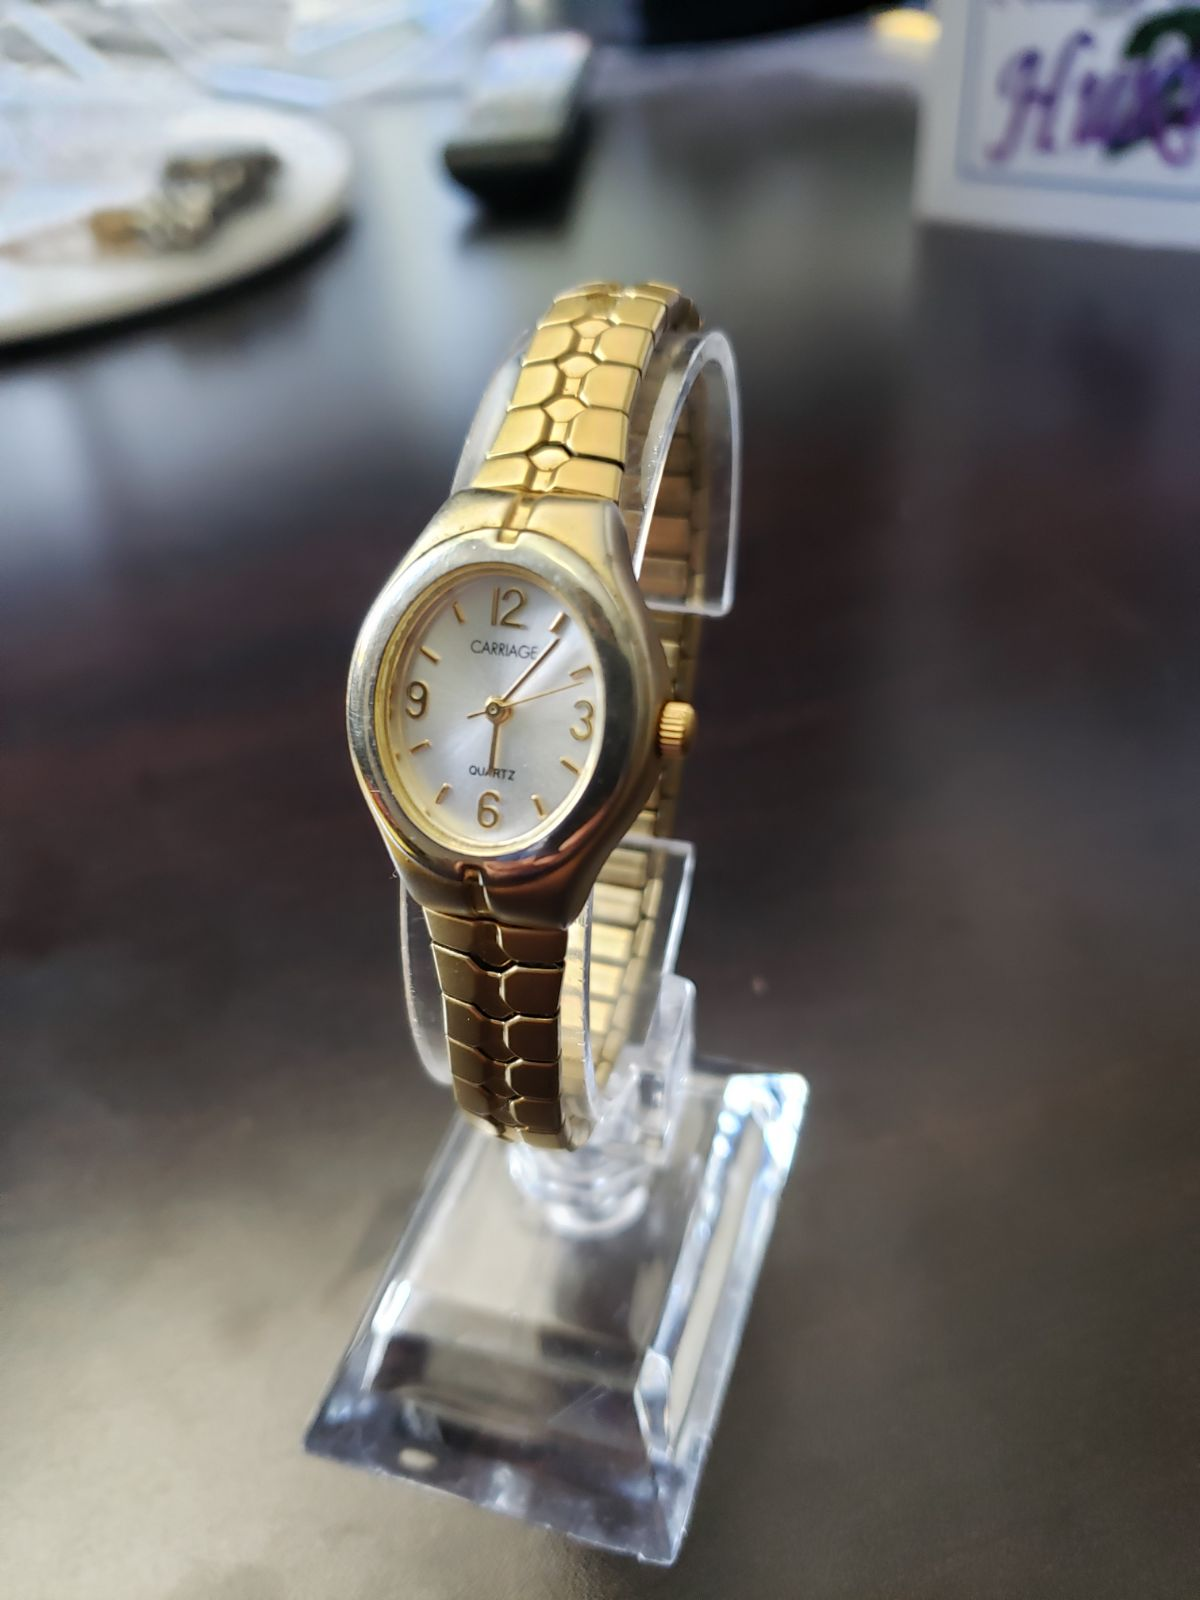 Timex fashion designed Carriage wristwat